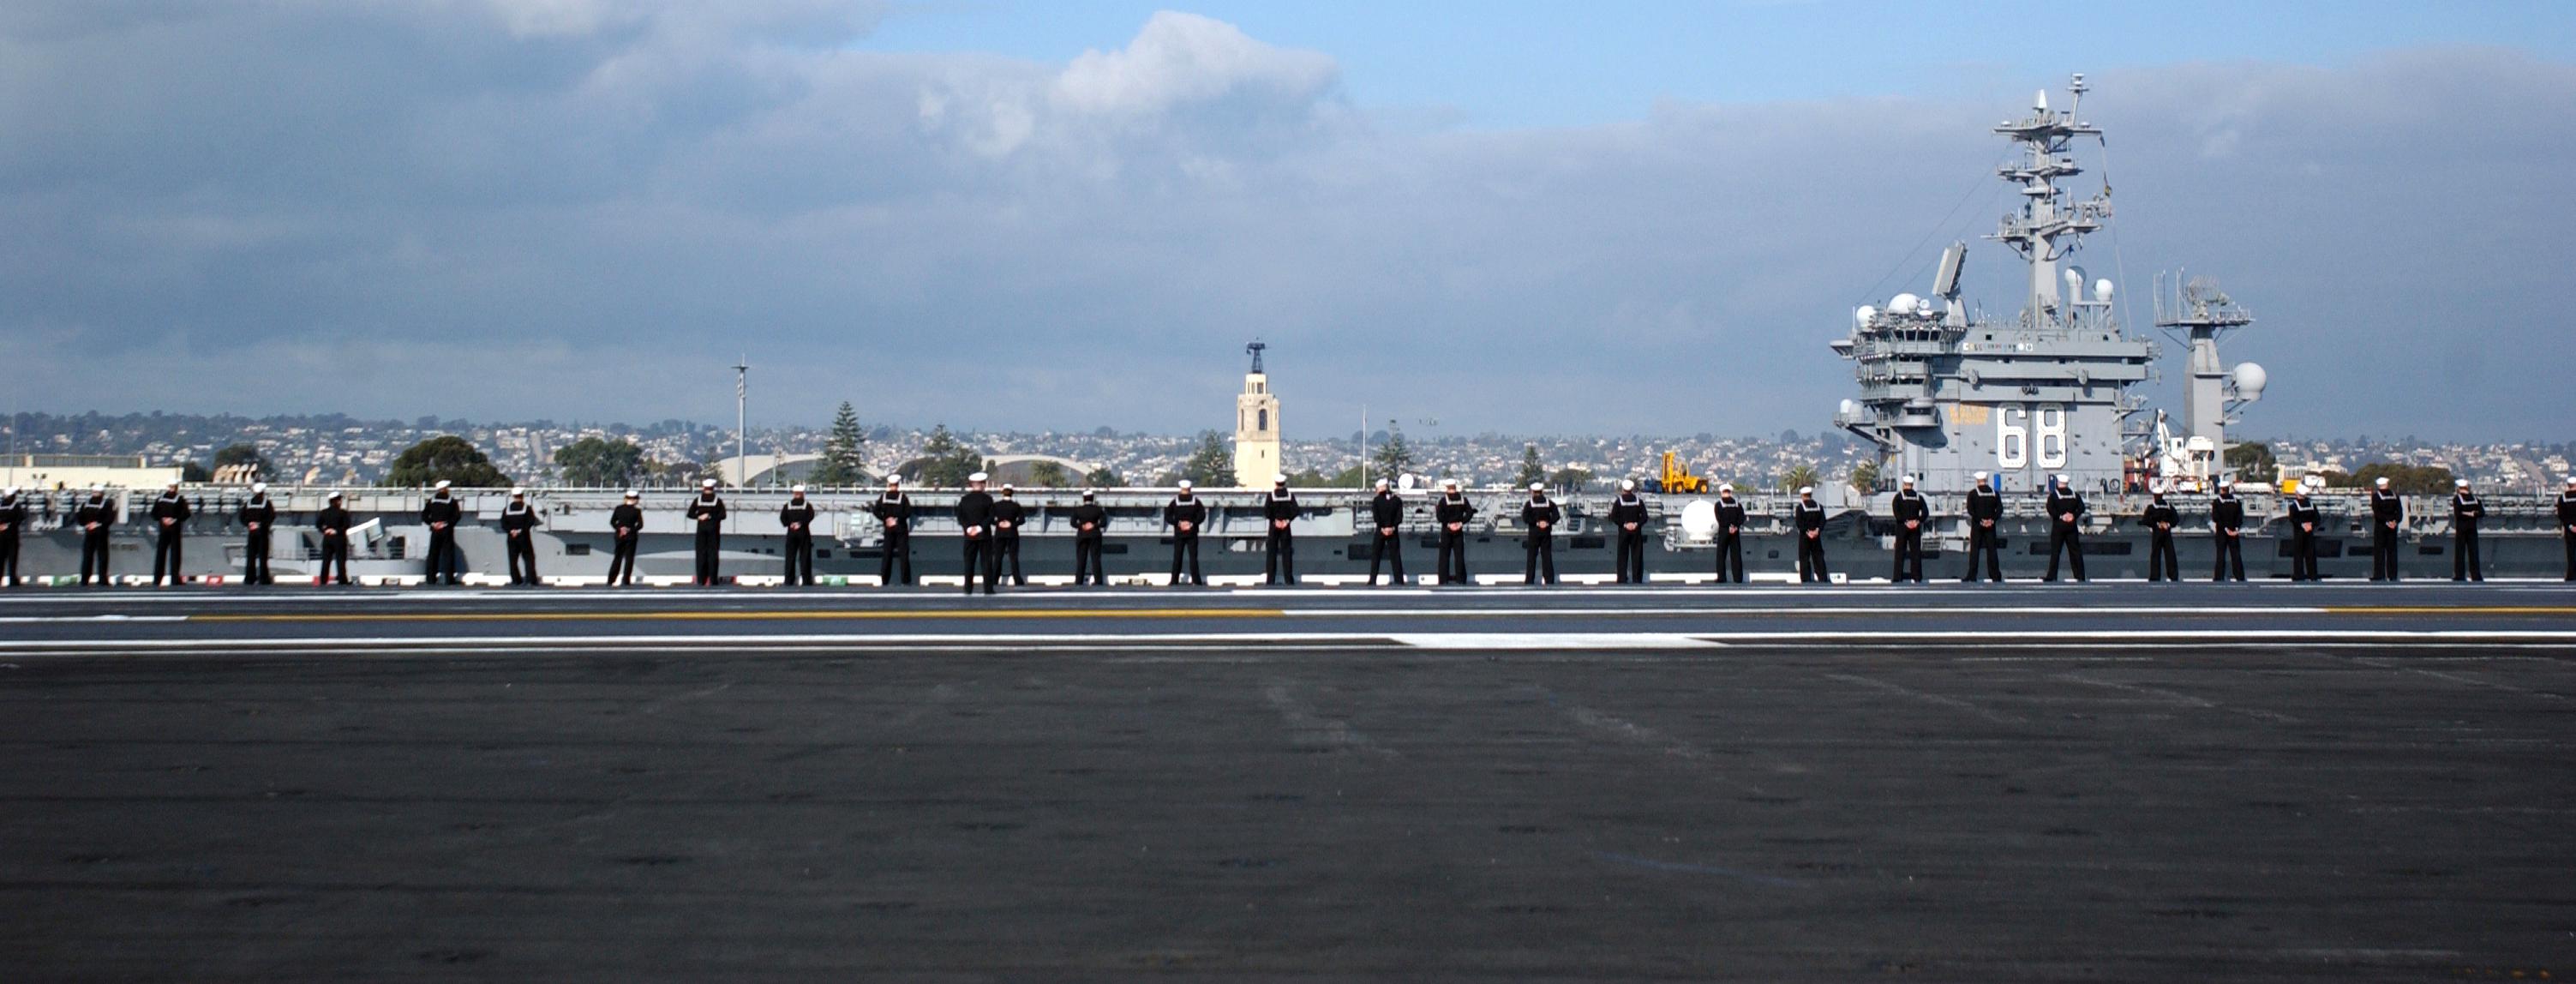 US Navy 070127 N 4776G 249 With USS Nimitz CVN 68 in the background 3006x1148